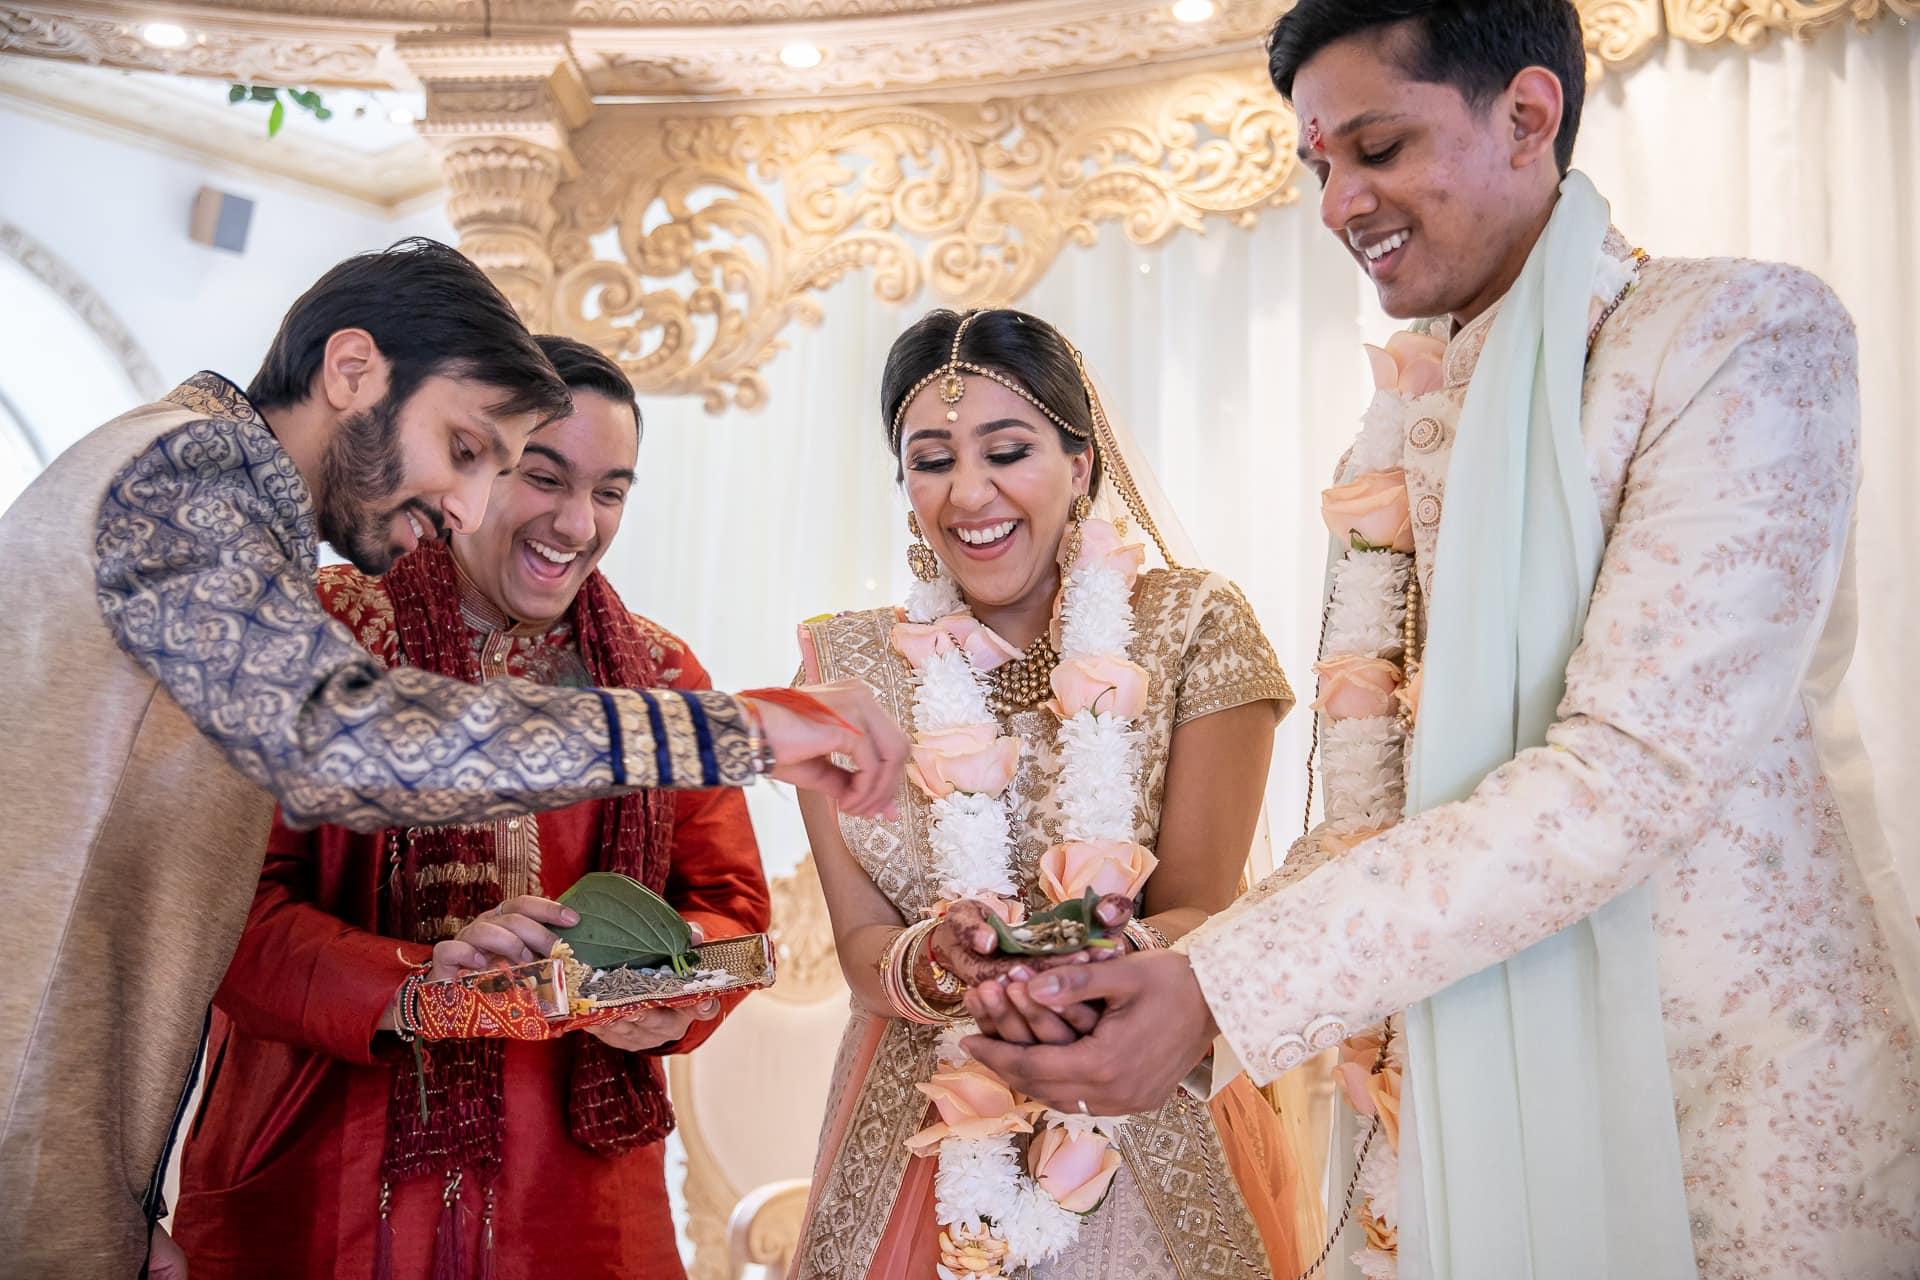 Phera ceremony during Indian wedding